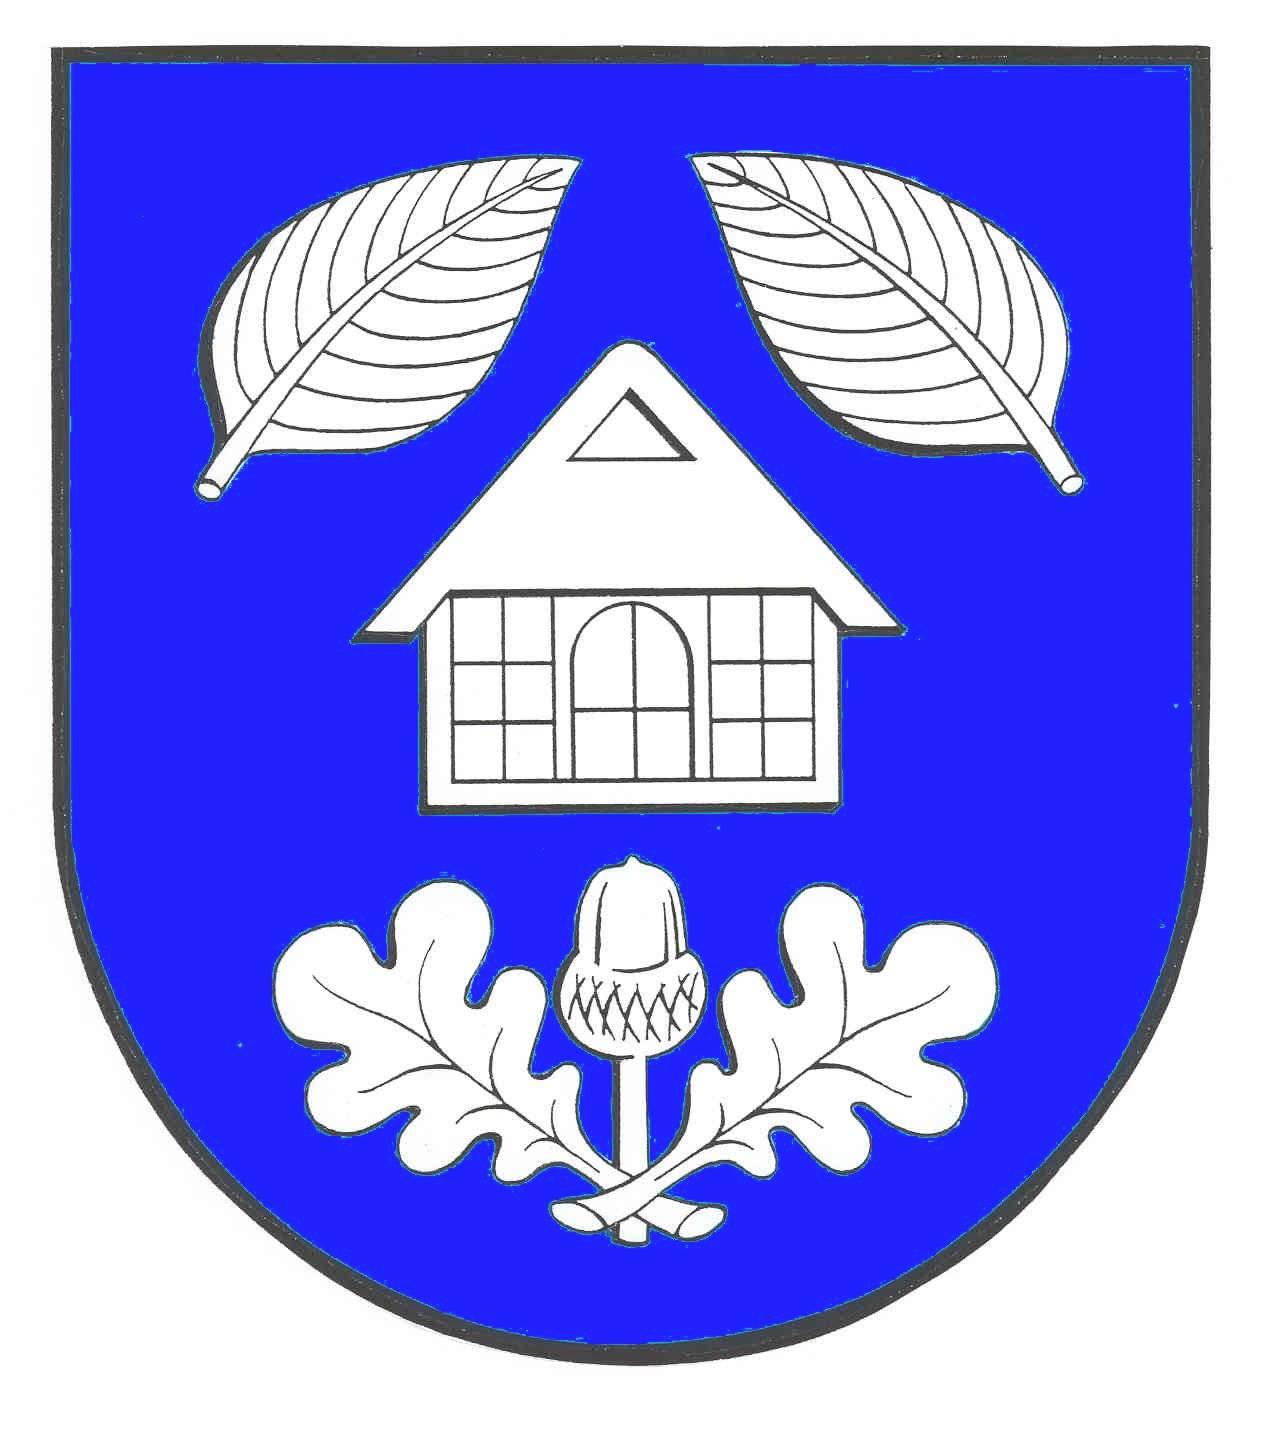 Wappen GemeindeHolzbunge, Kreis Rendsburg-Eckernförde